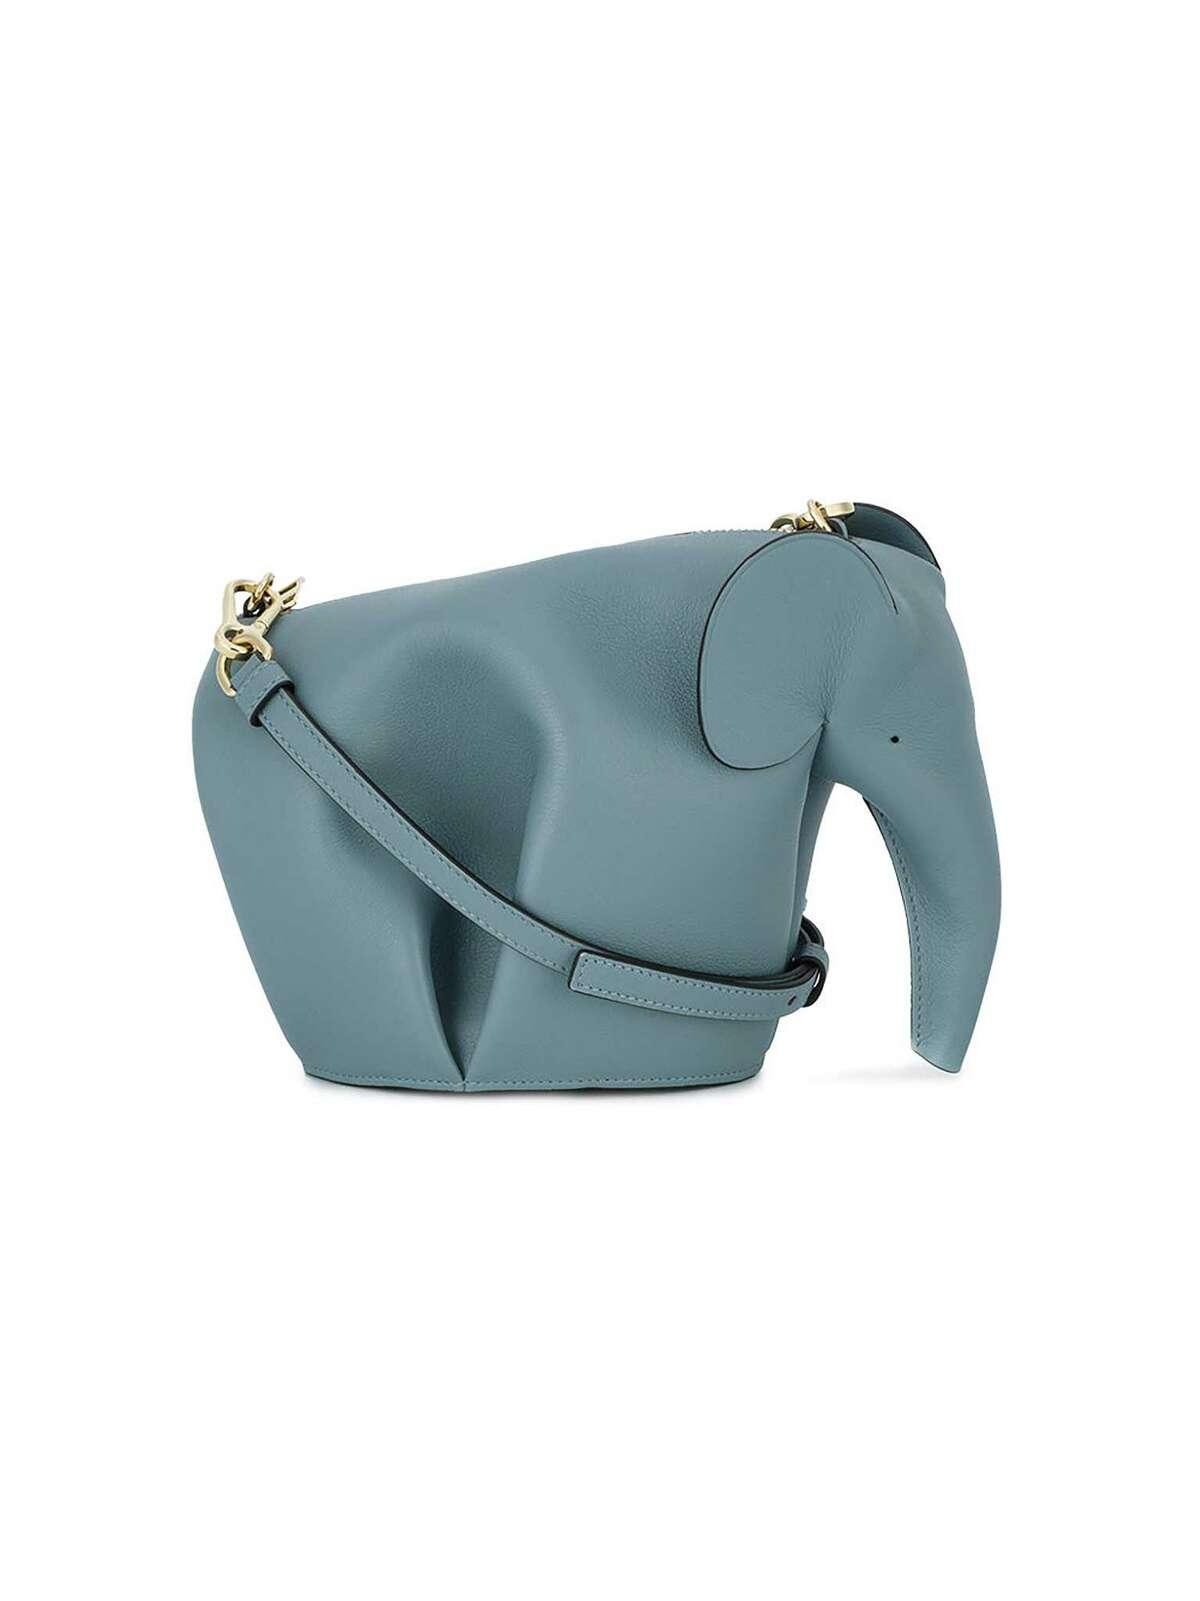 Loewe Mini Elephant Bag; $1,290 at The Webster, Galleria